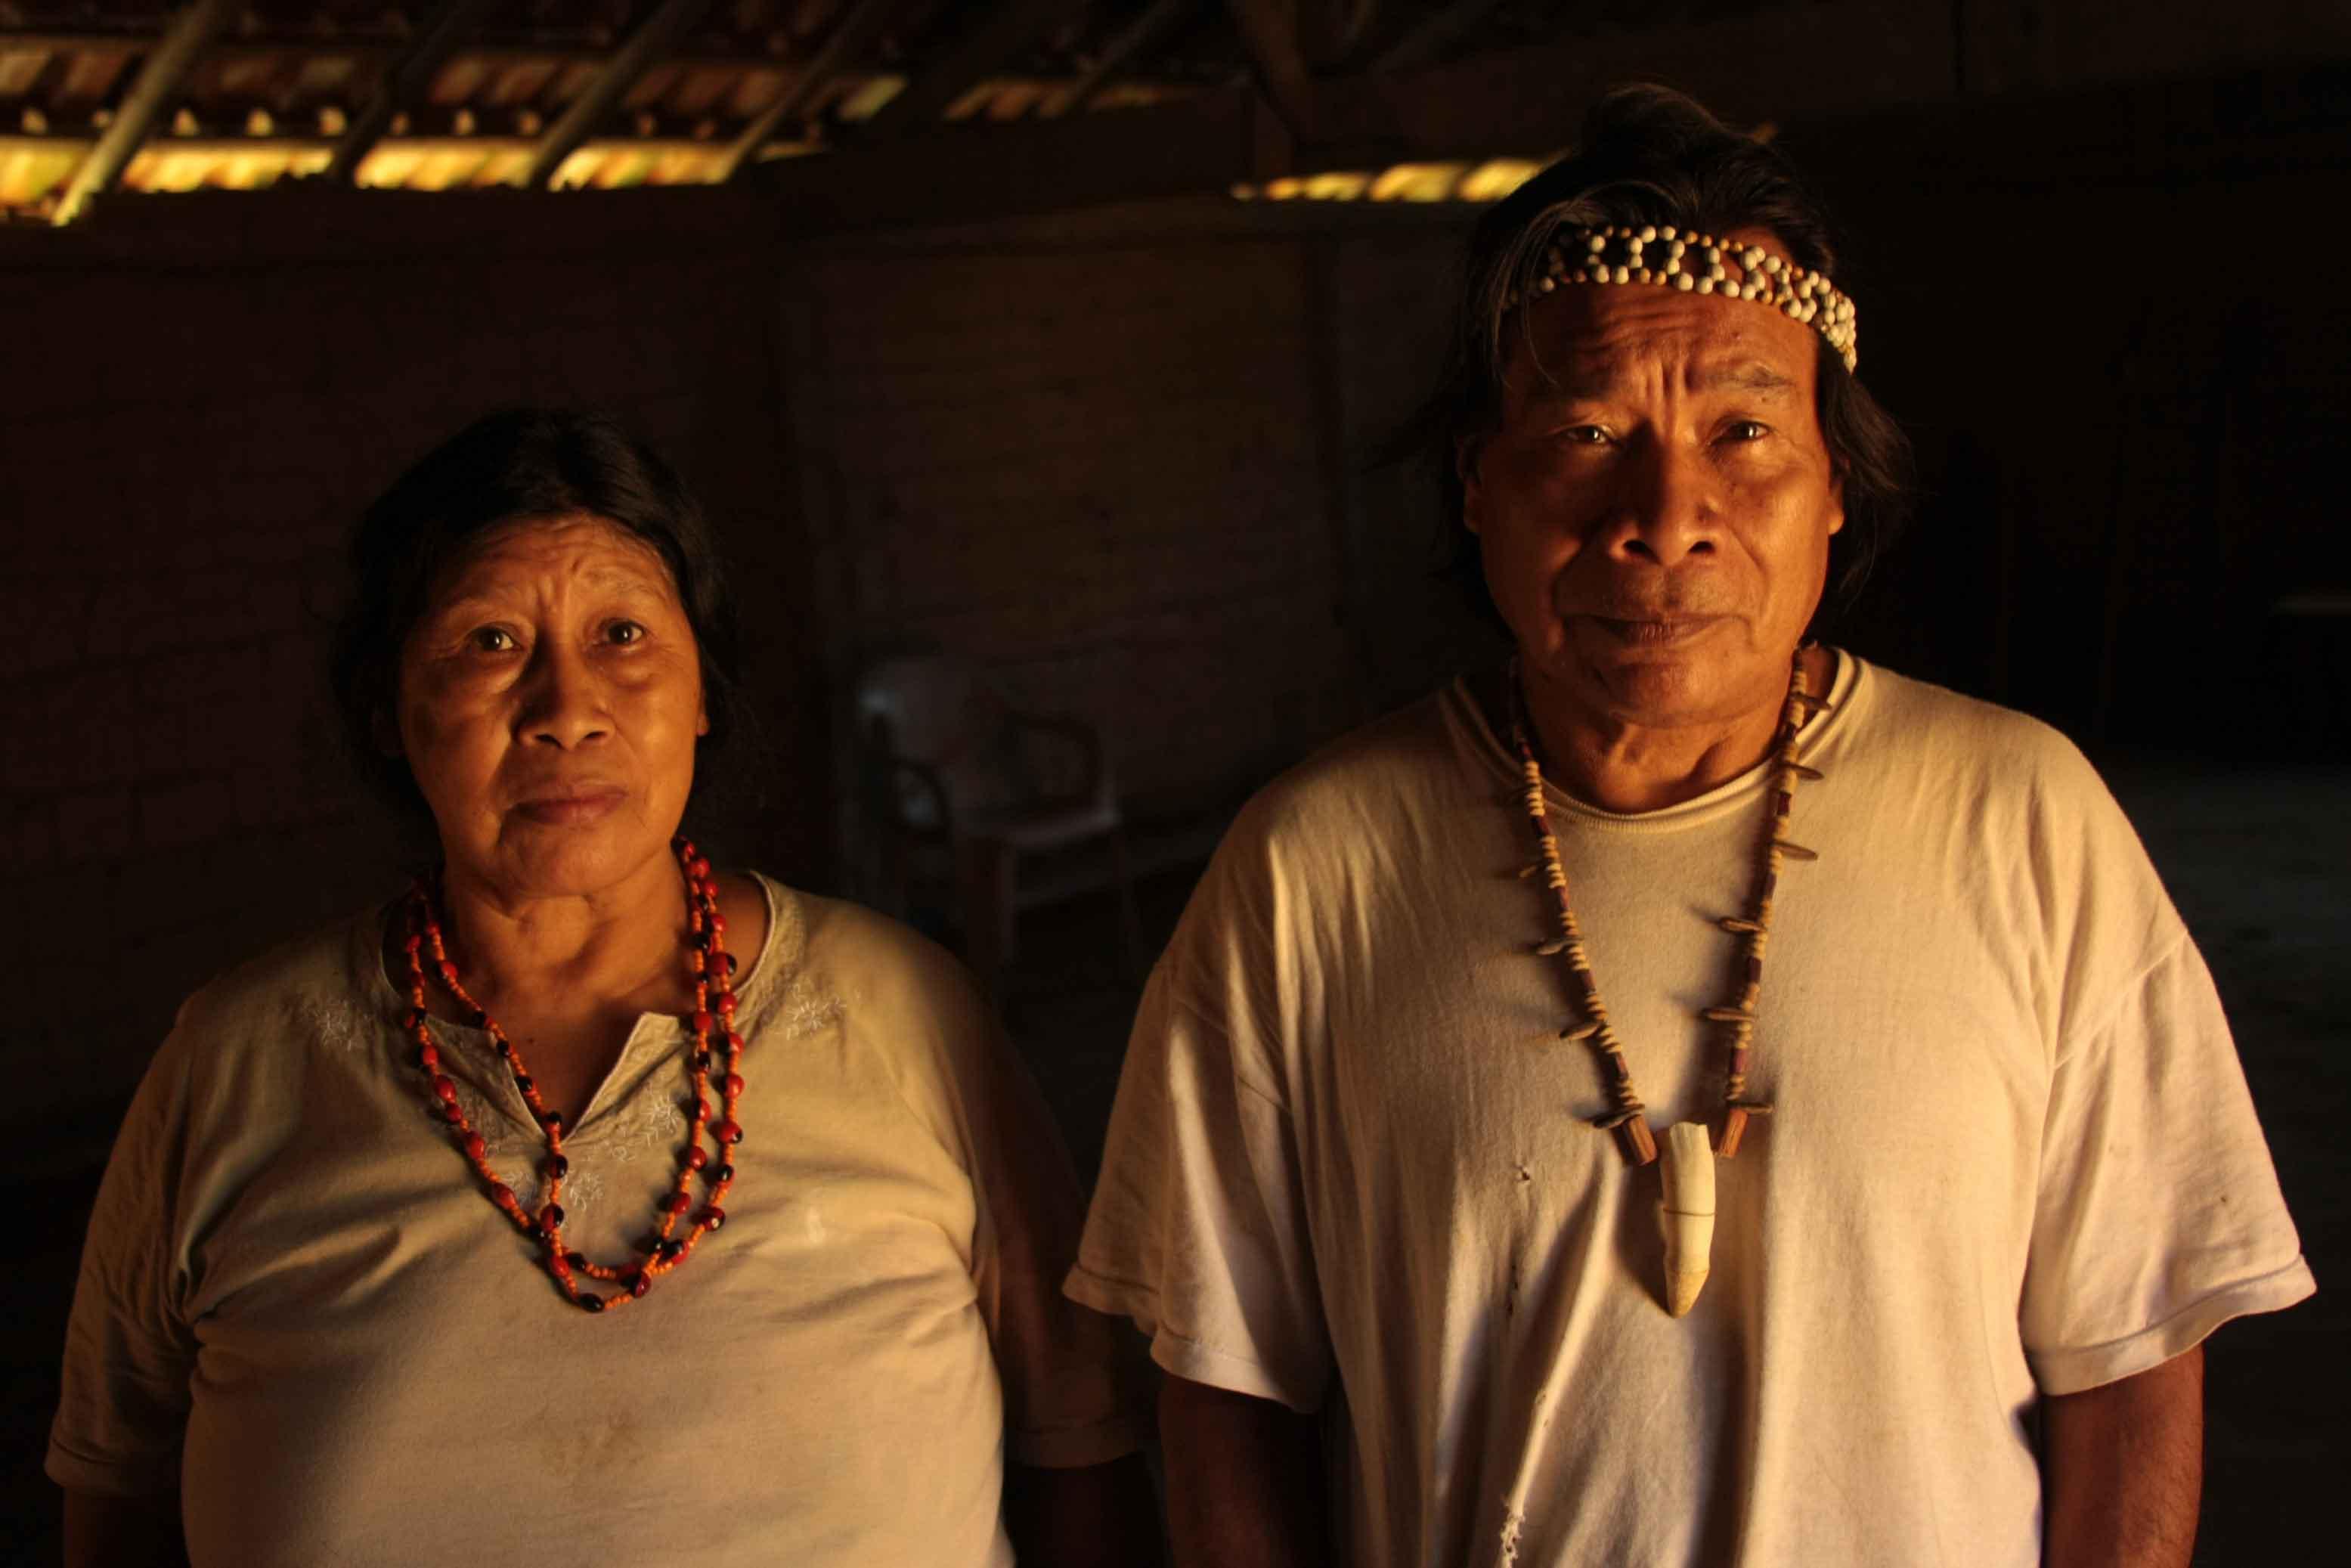 Ubatuba-cultura-comunidades-aldeia-boa-vista-729-bx